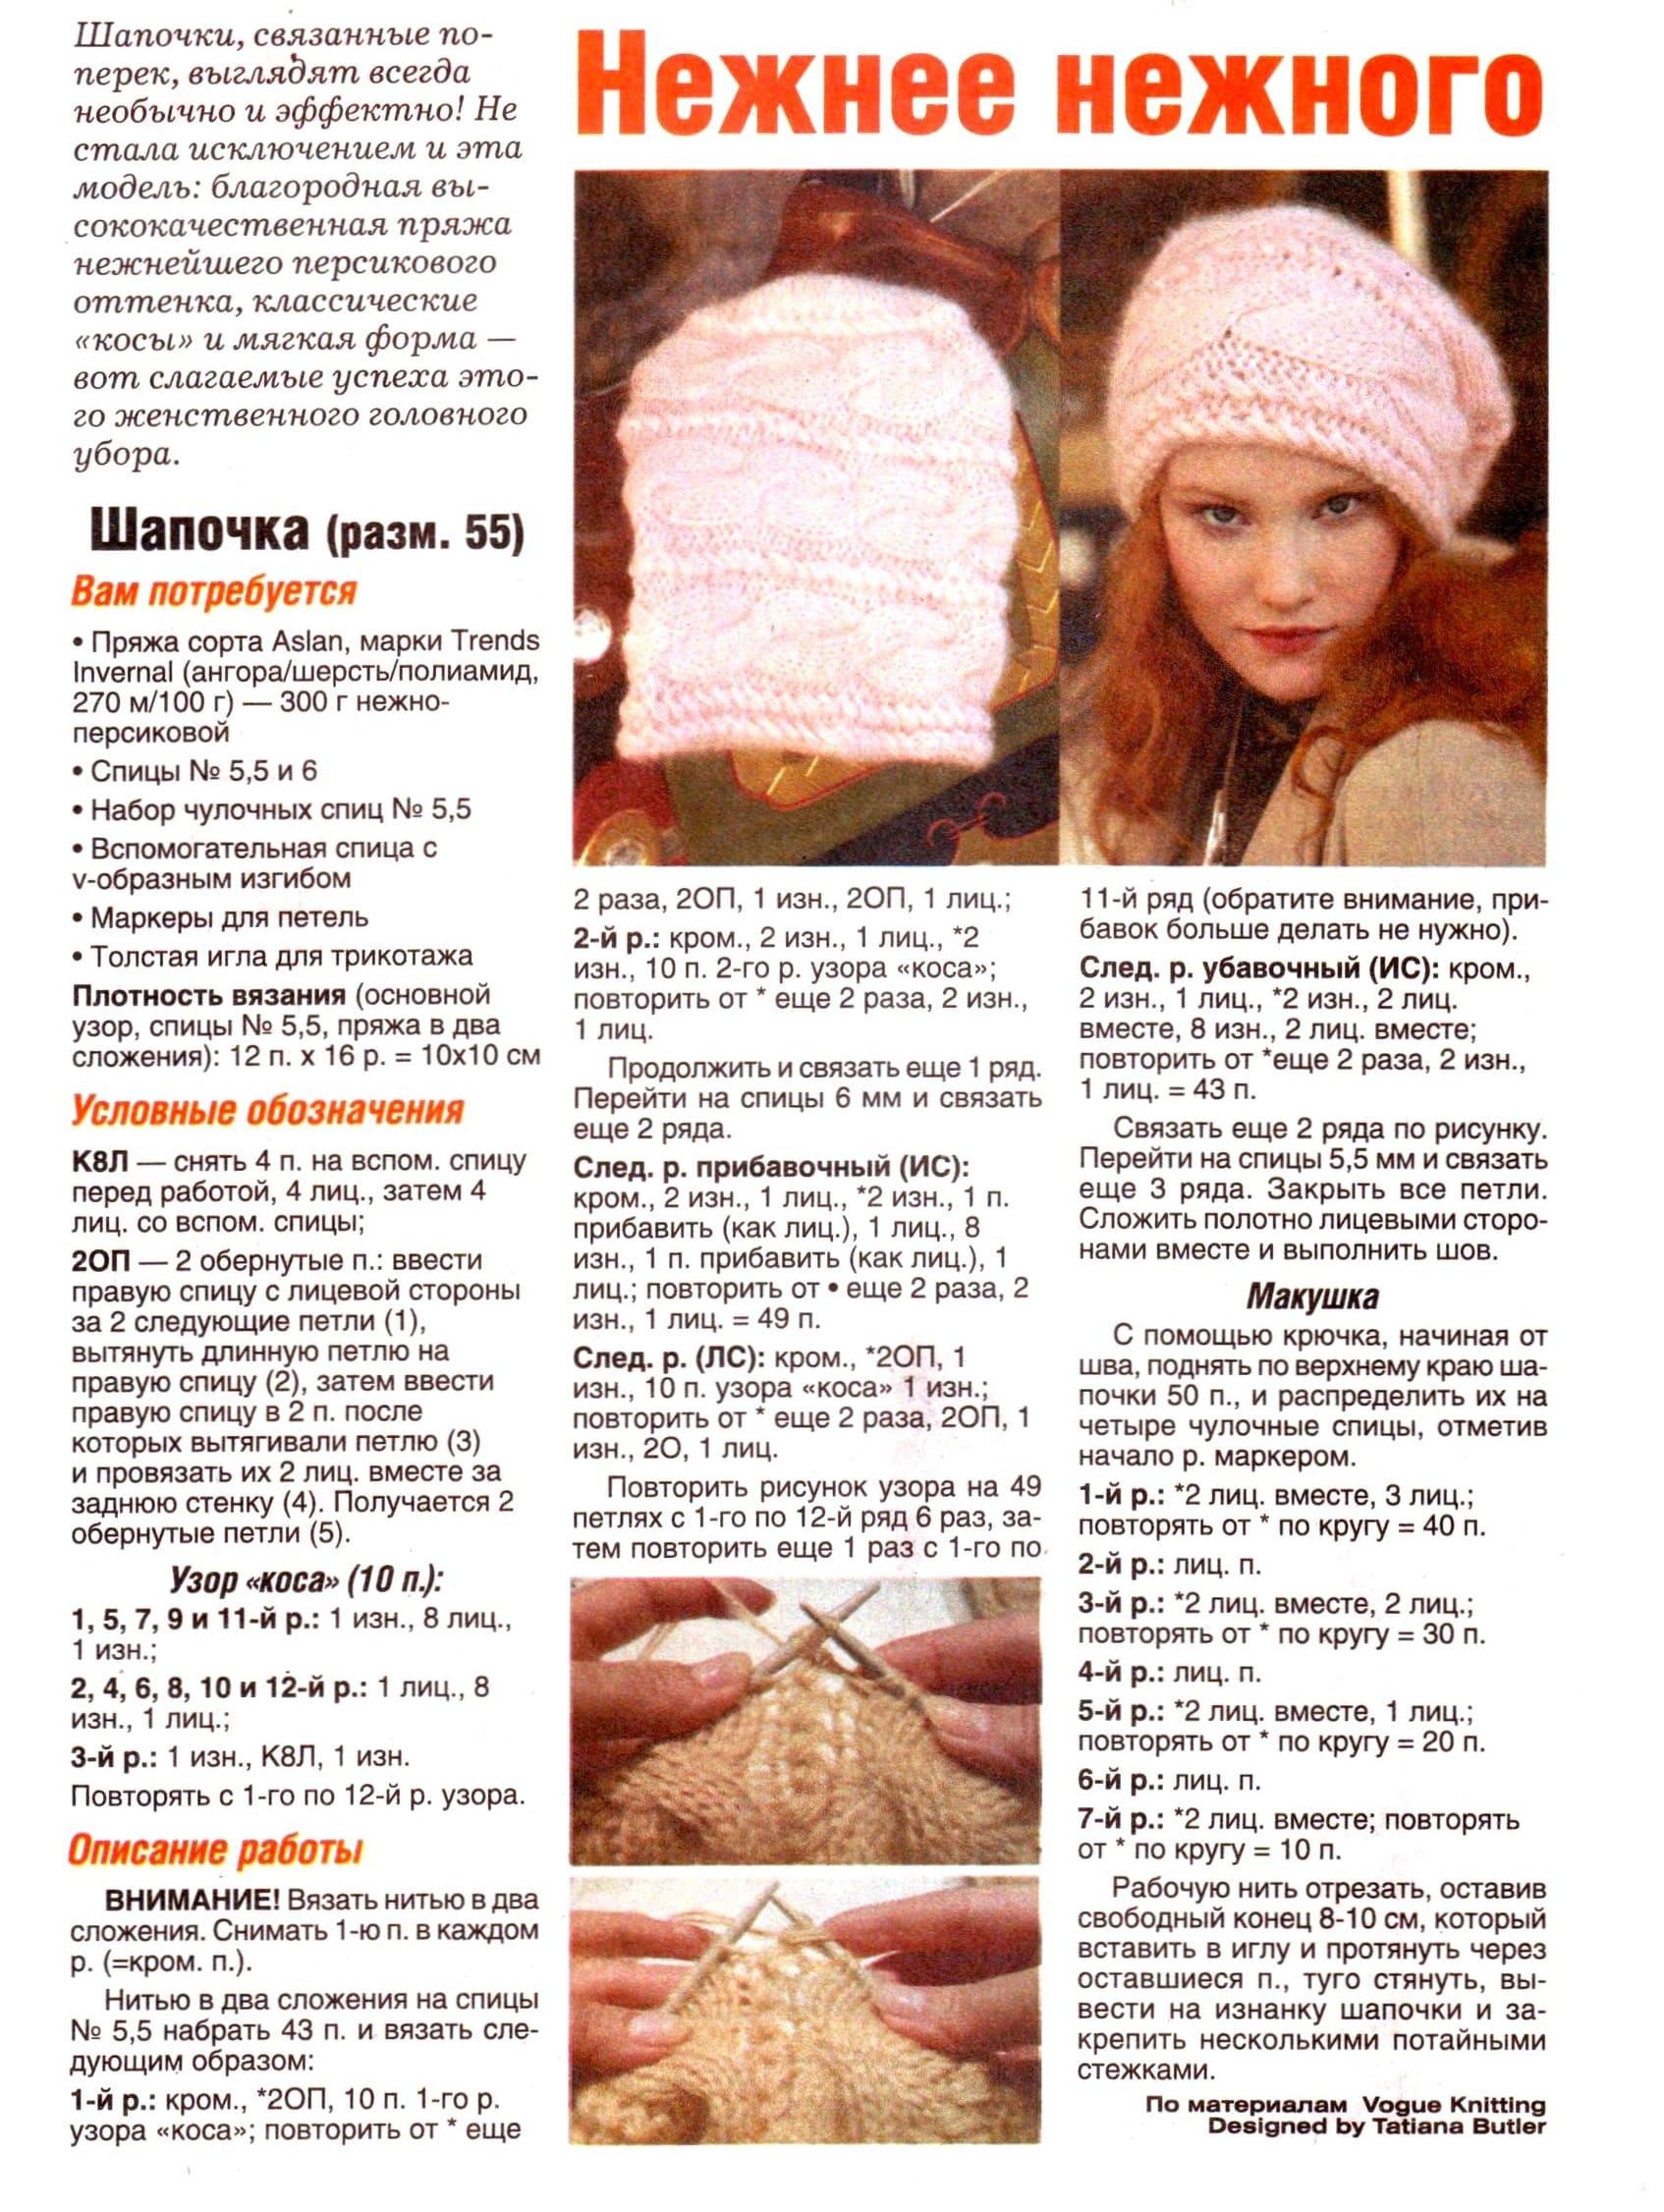 фотографии женских шапок с описанием вязки забуду дома смартфон